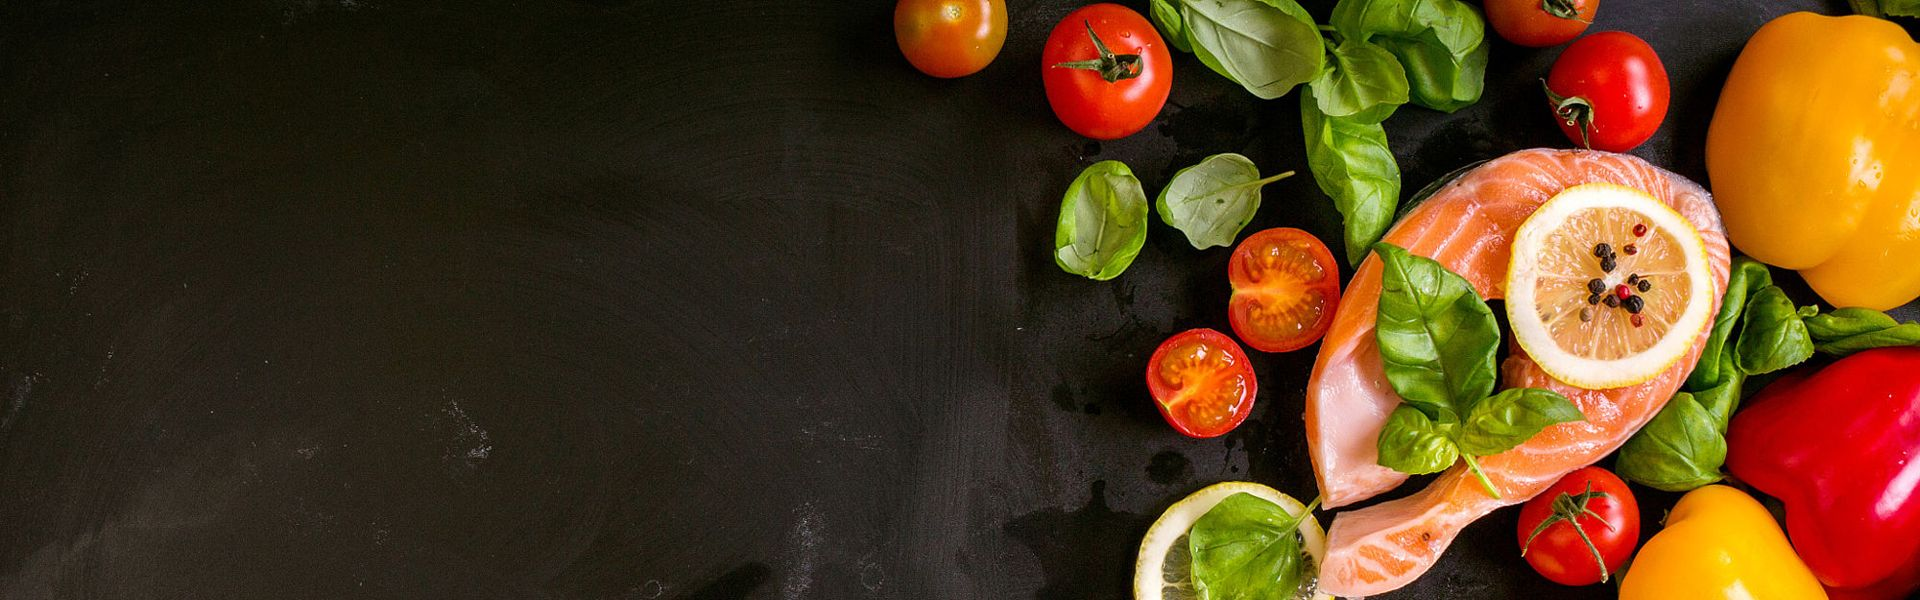 Fresh Fruits And Vegetables Food Background Food Food